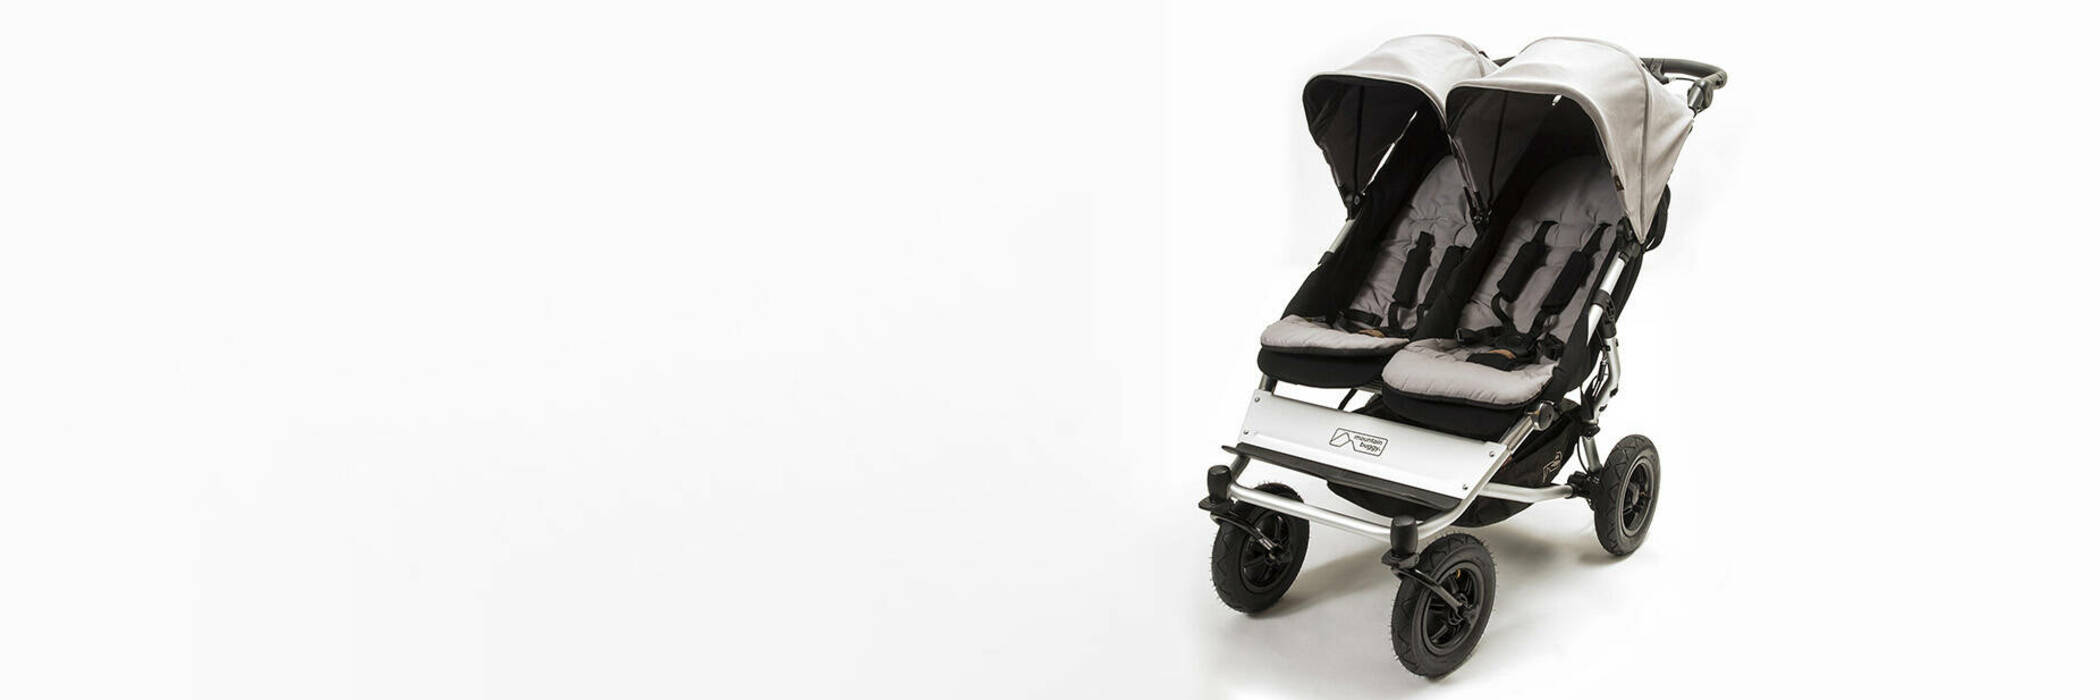 Mountain Buggy Duet 2017 stroller